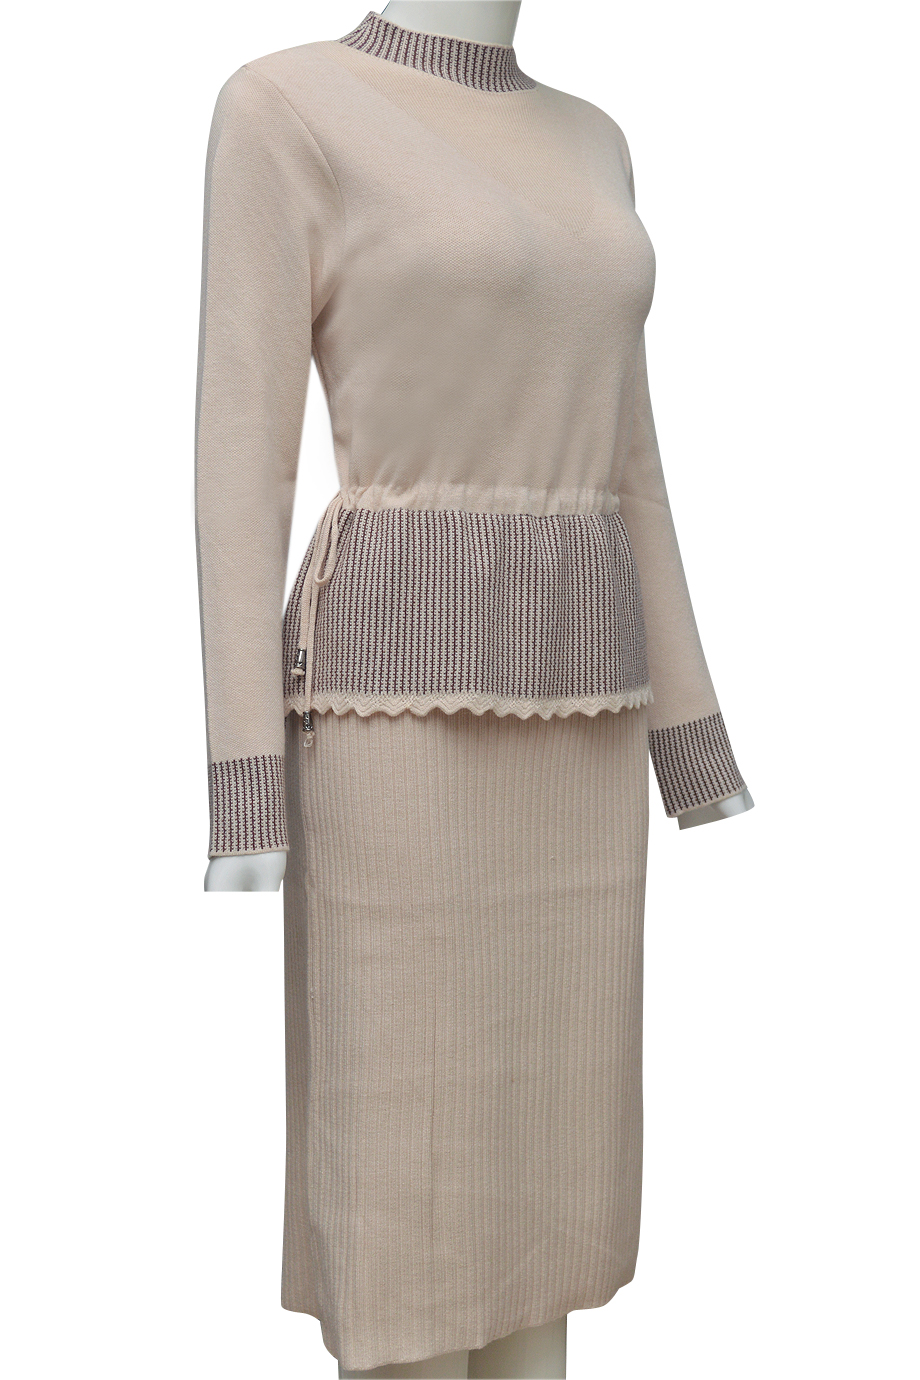 Váy len thời trang ELMI cao cấp màu kem EV45